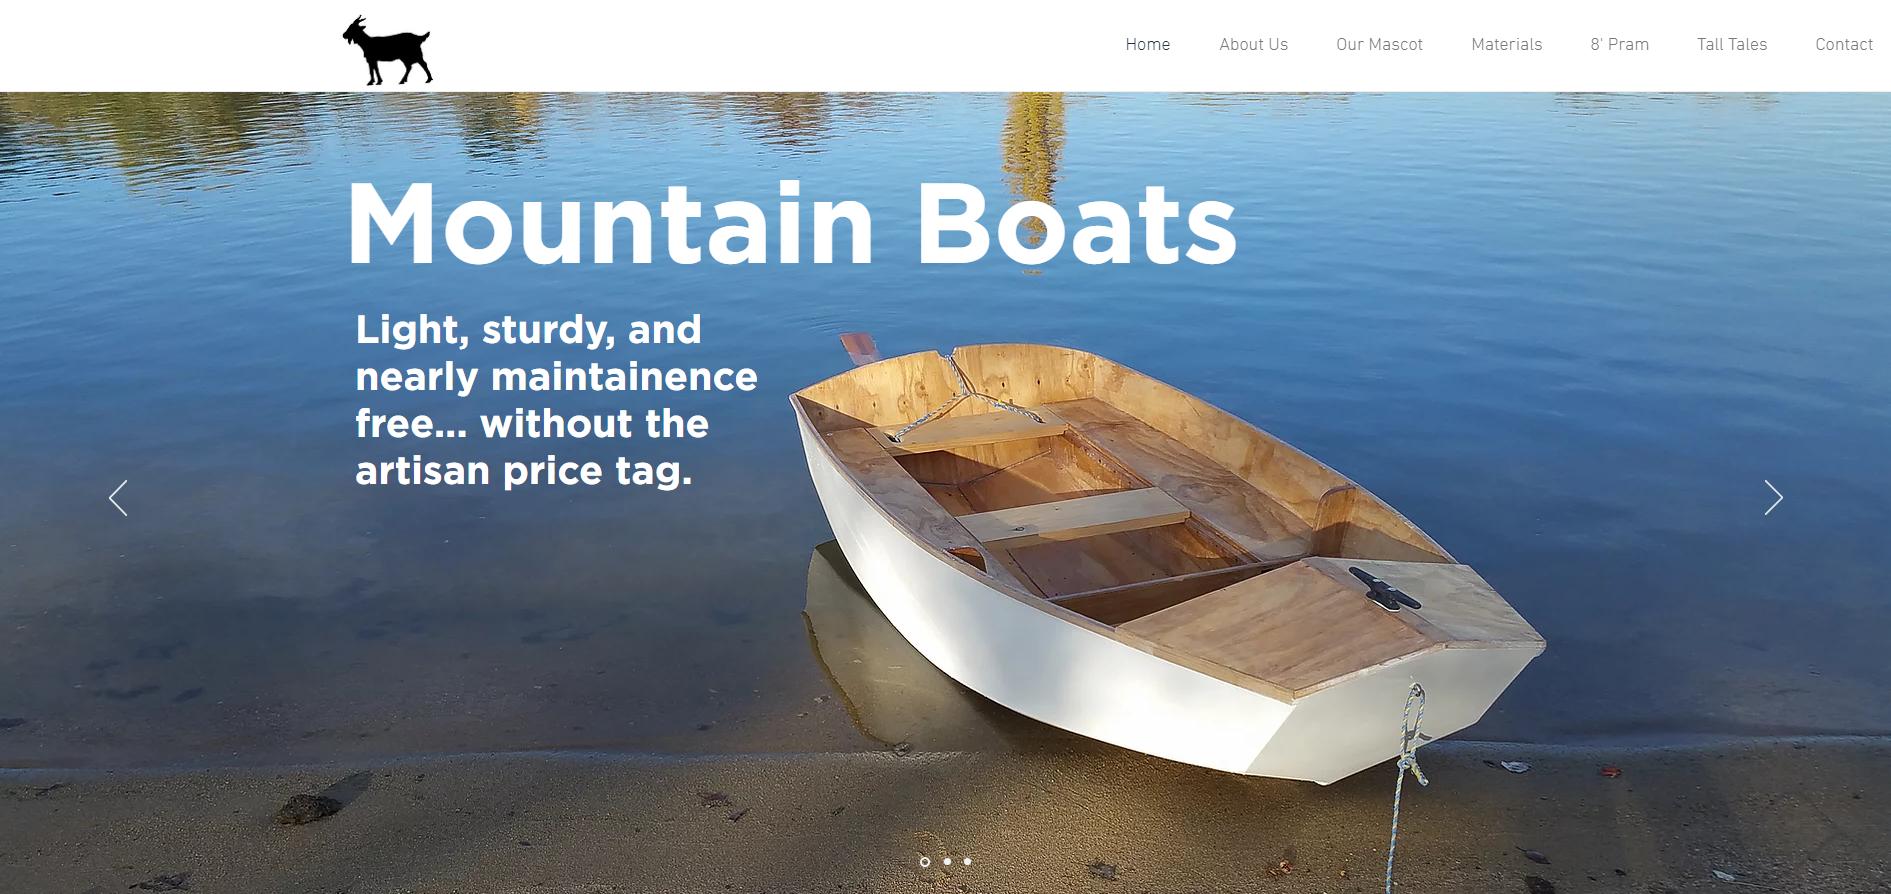 Mountain Boats